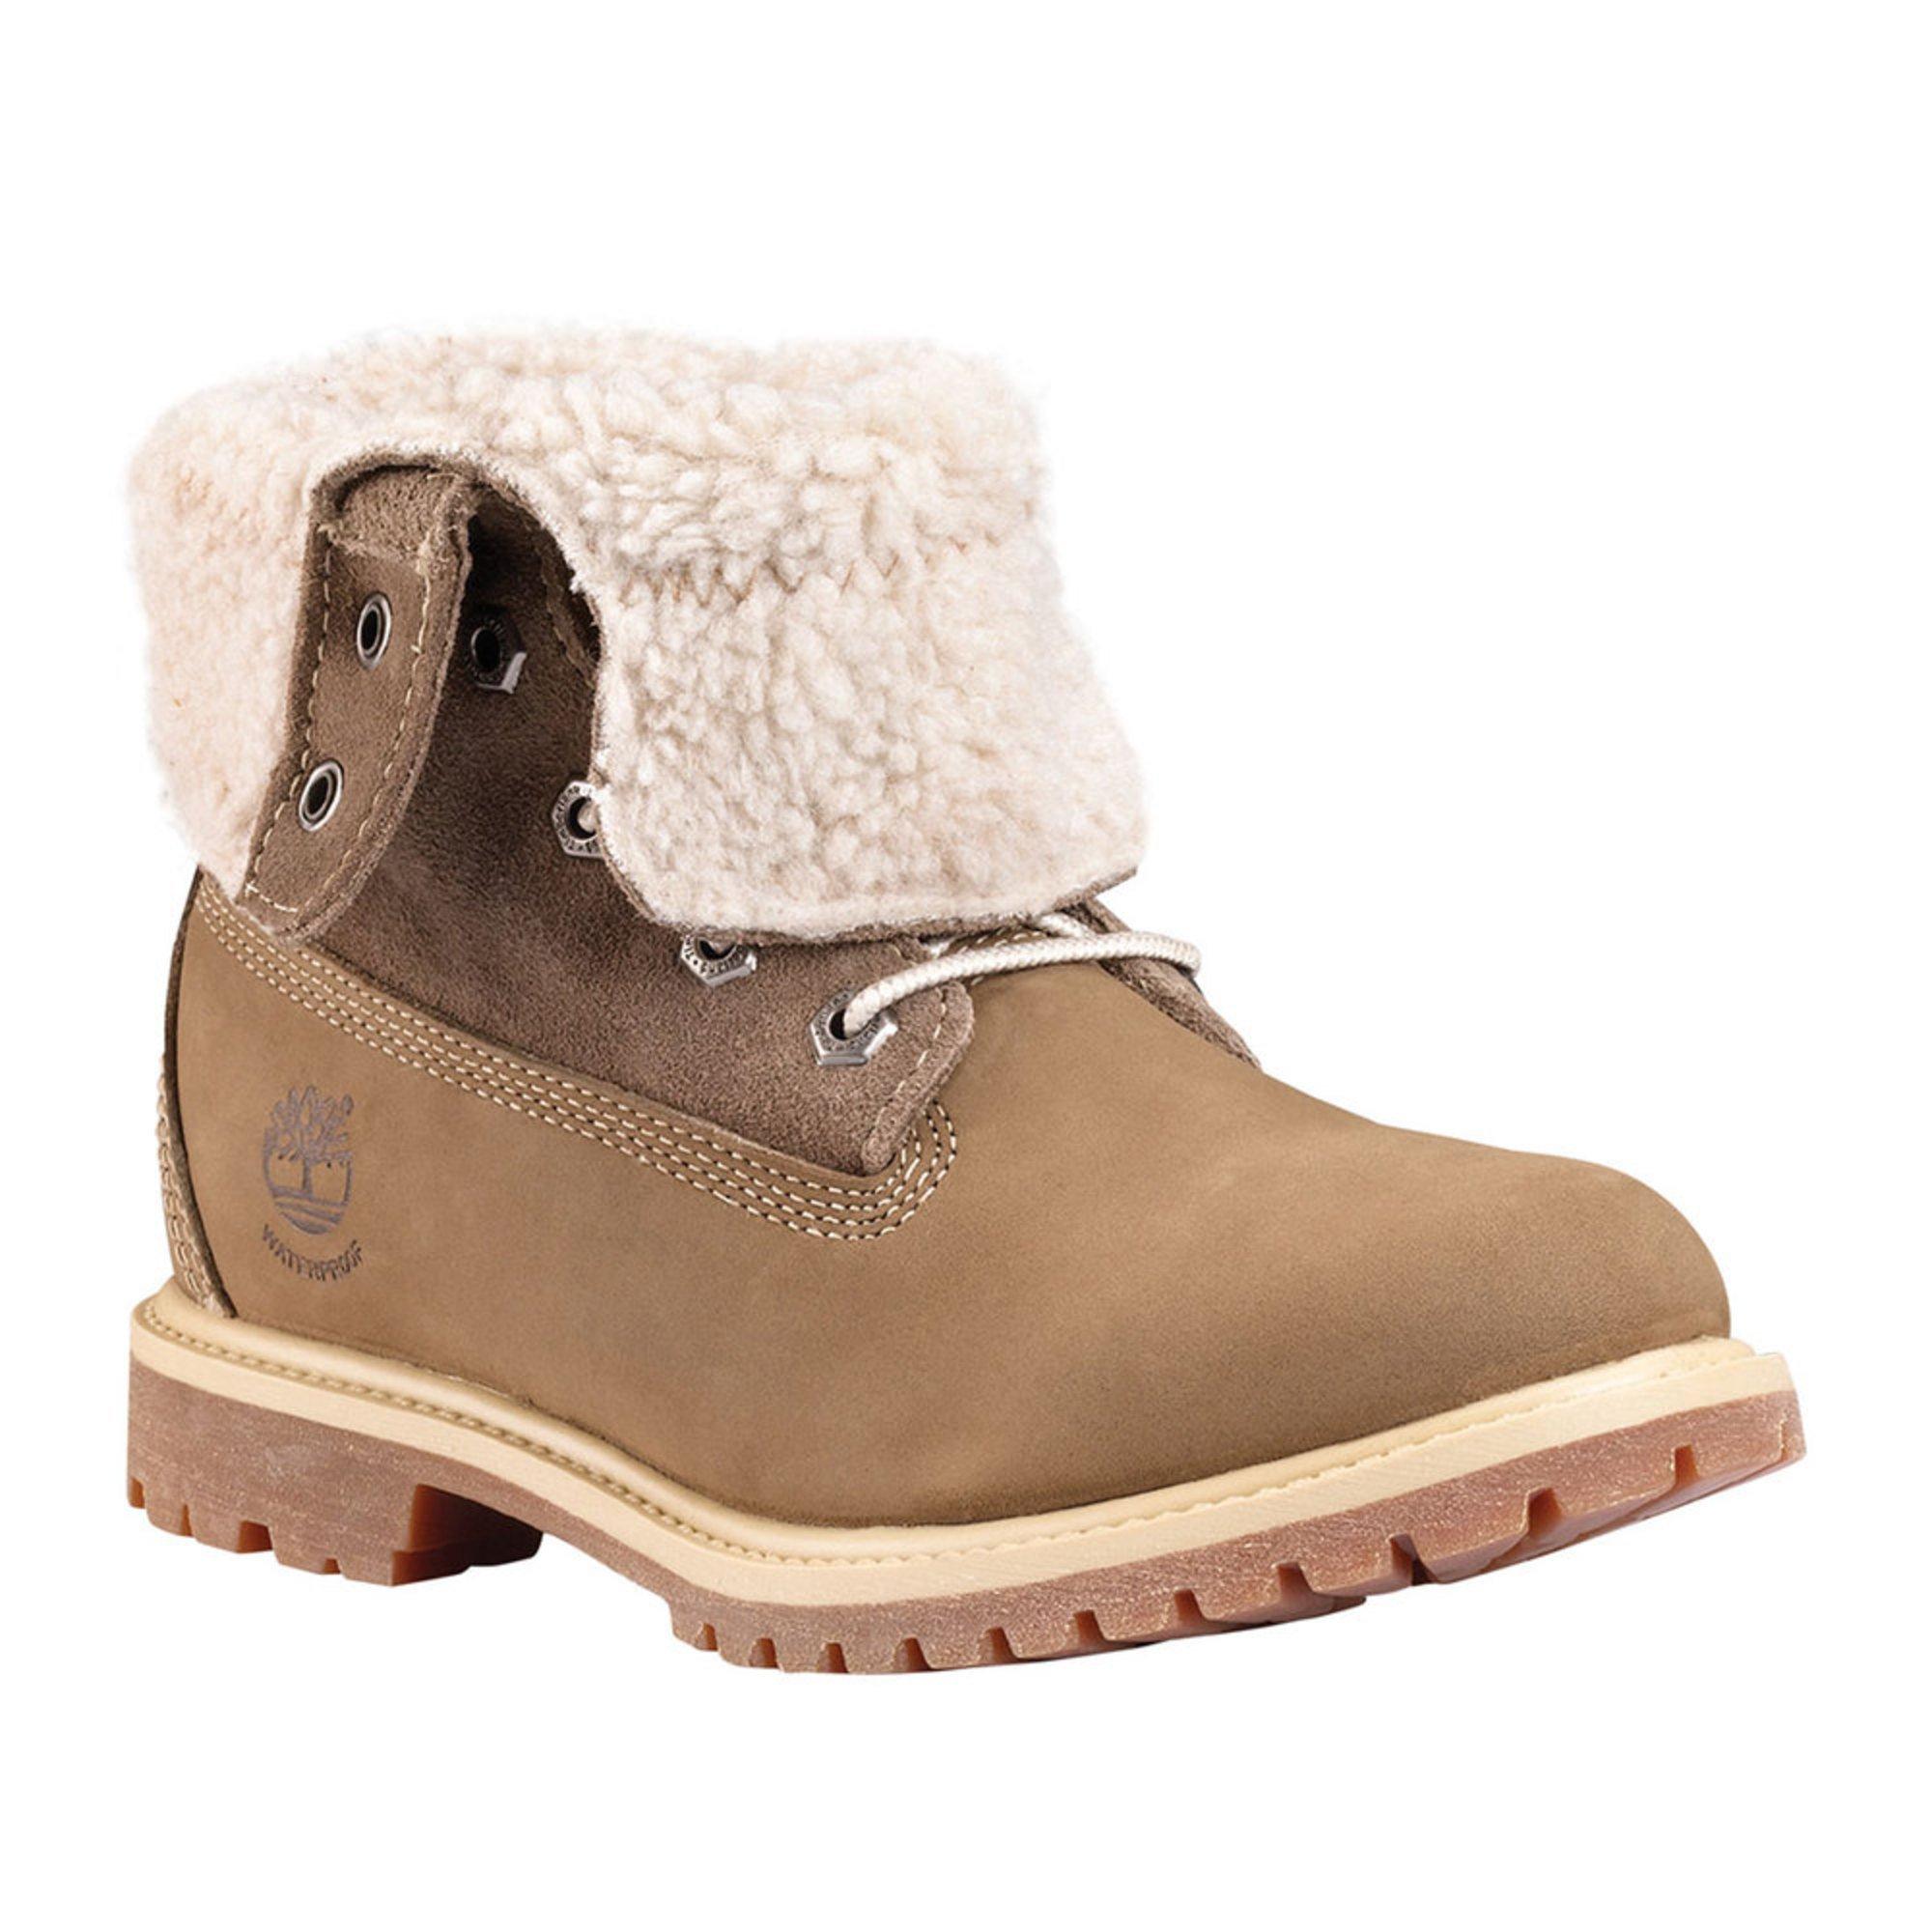 Timberland W Authentics Teddy Fleece Fold-Down Boot uiJYR4U